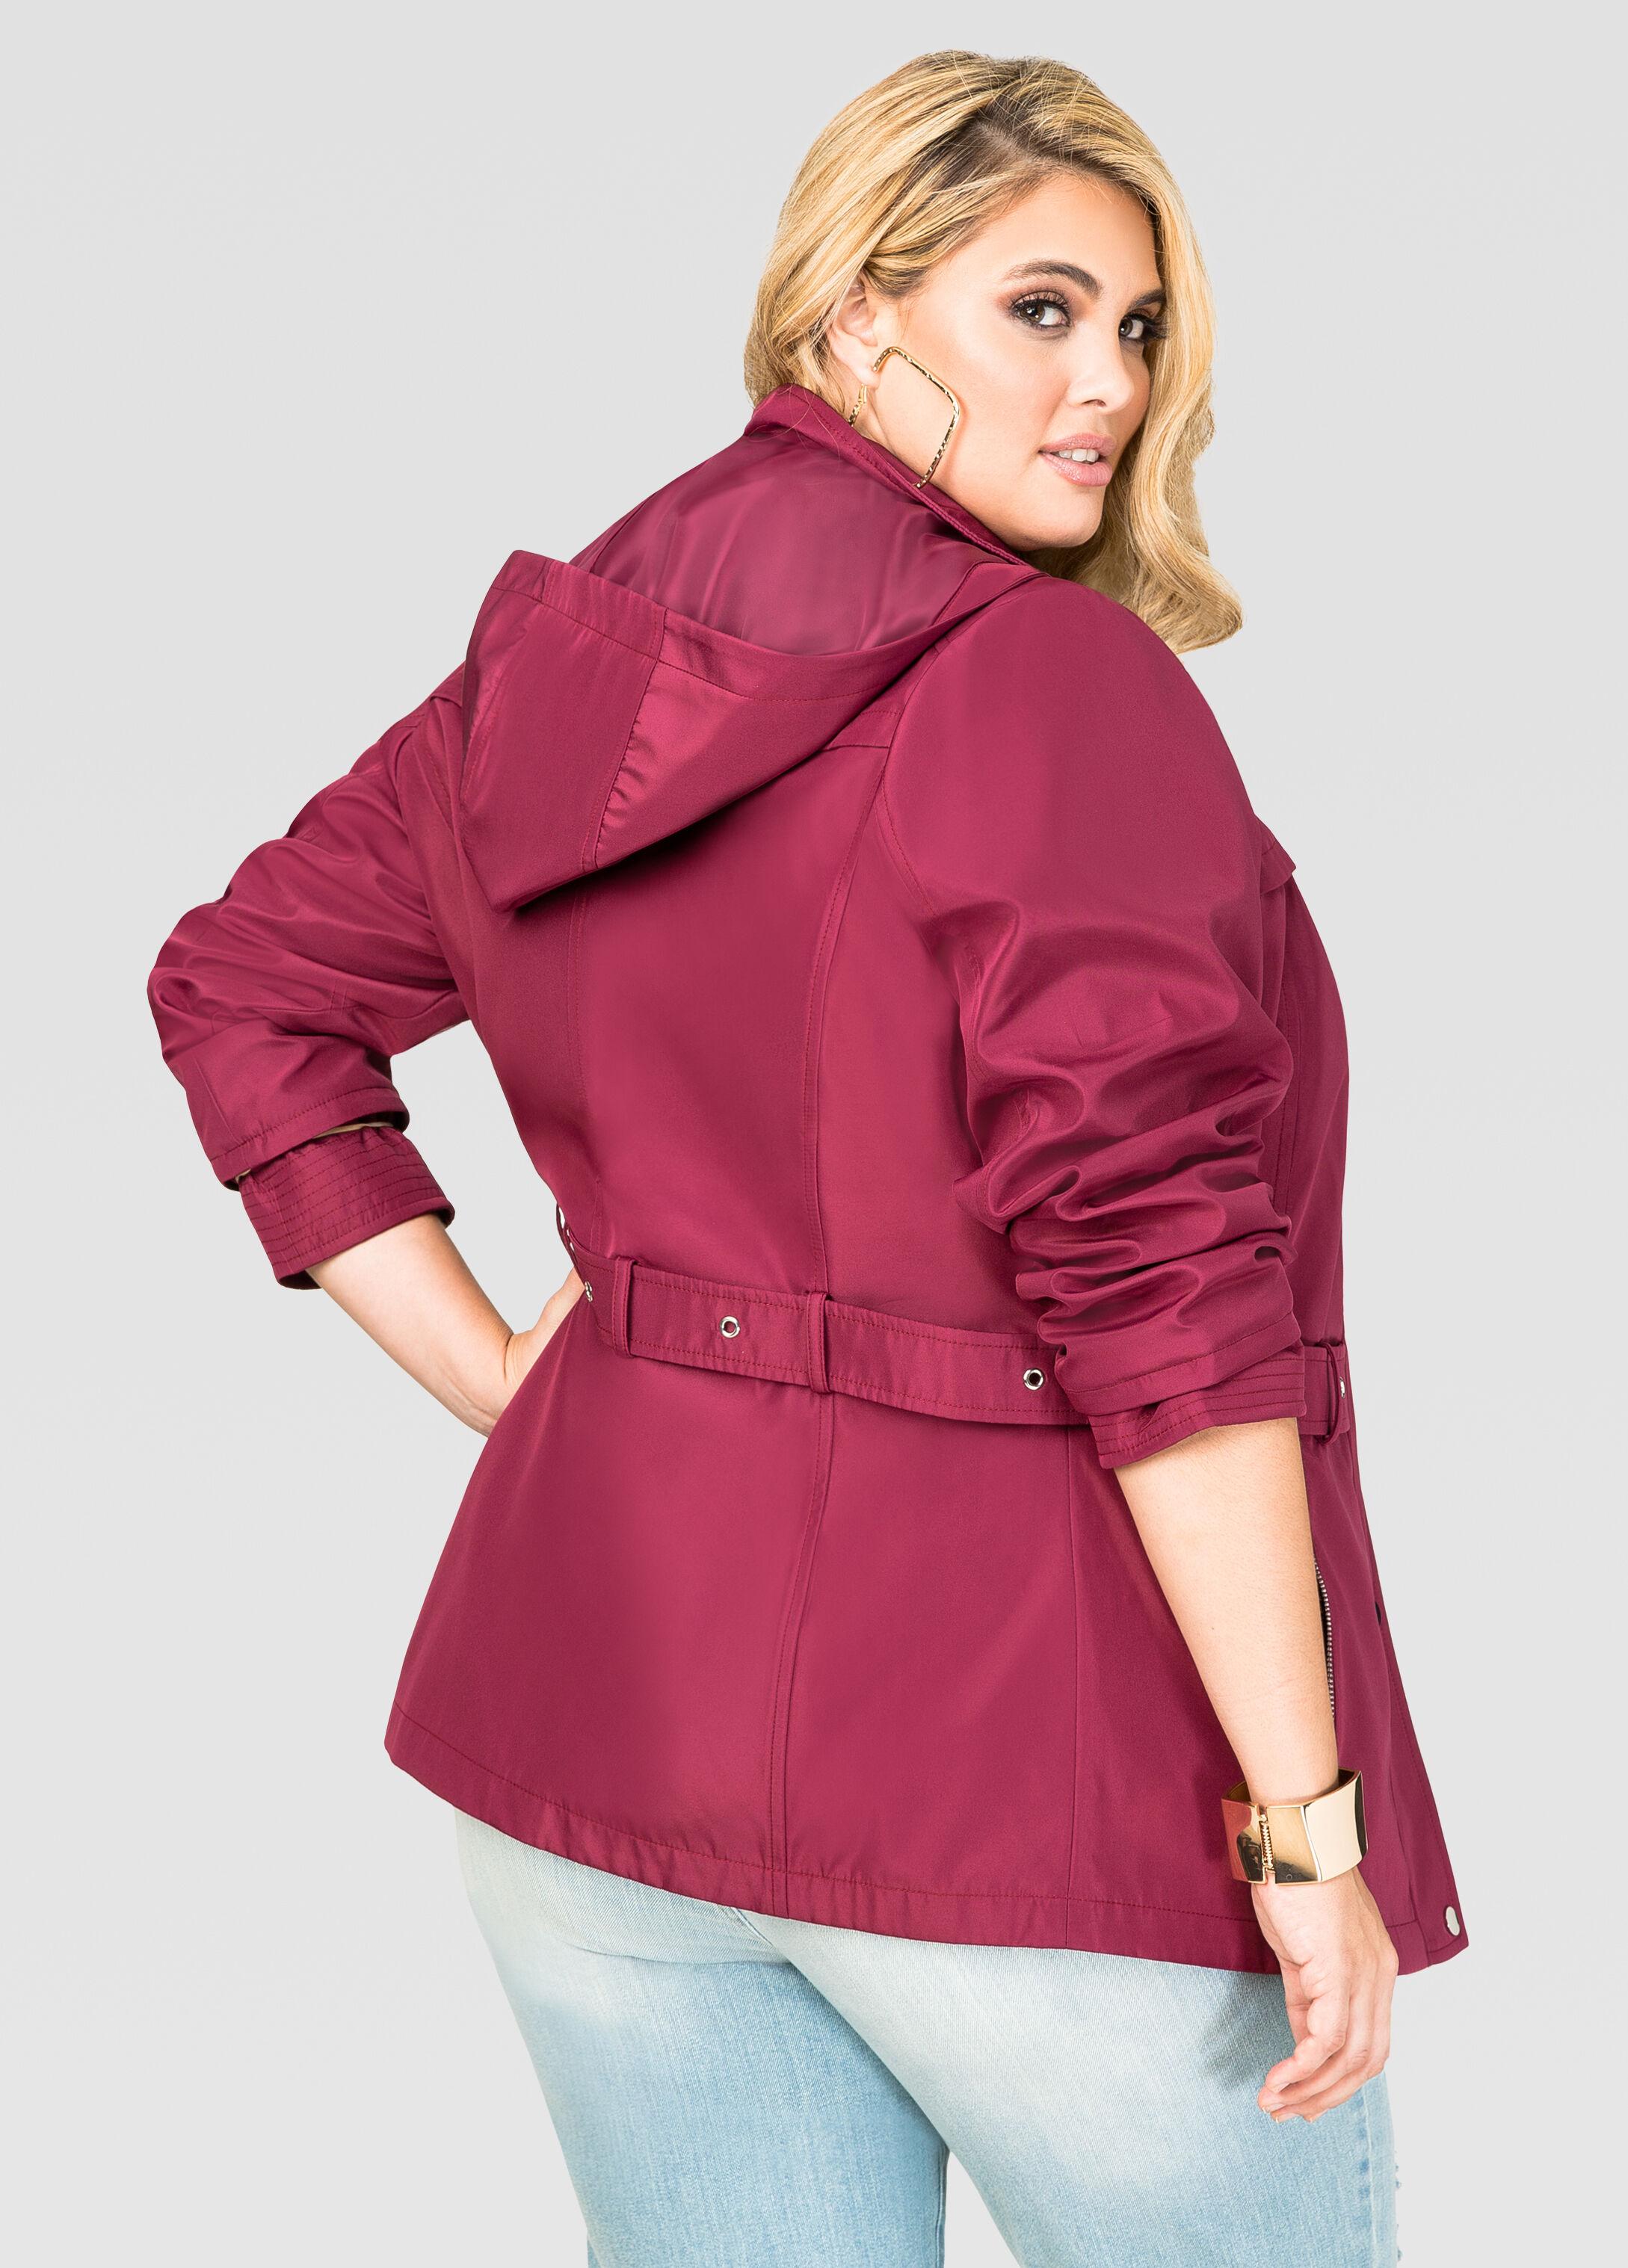 Removable Hood Soft Shell Jacket